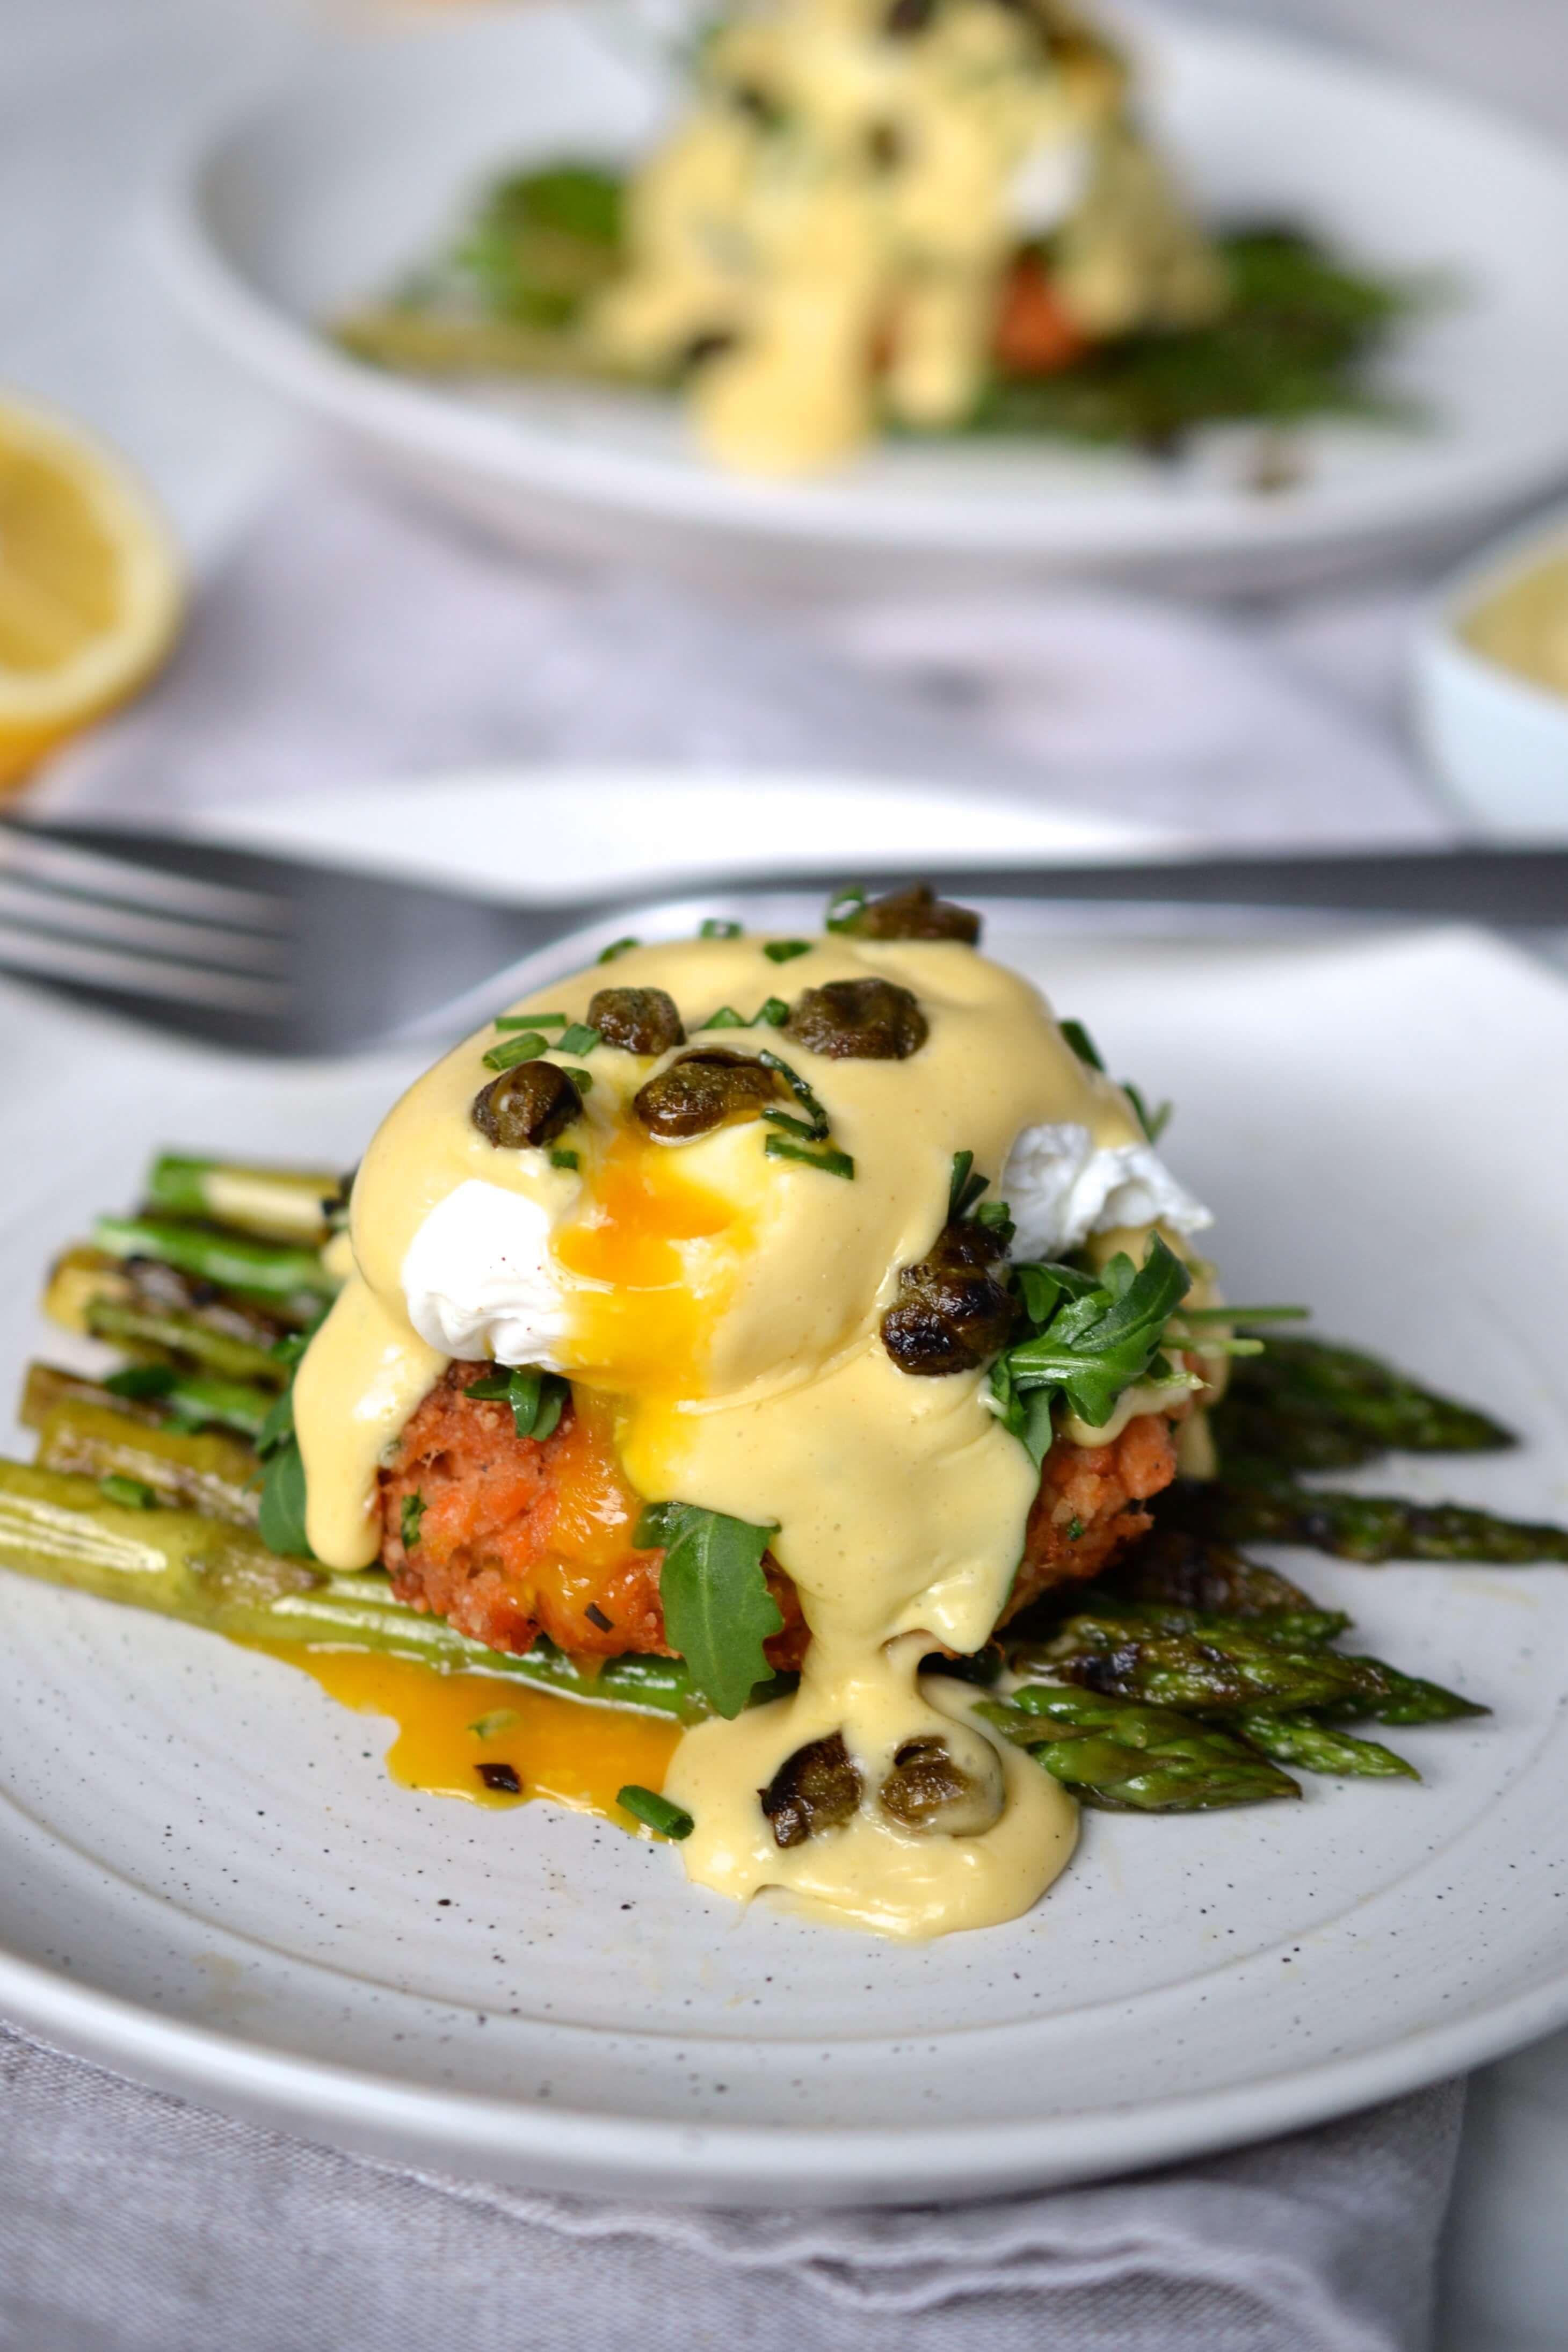 Salmon Cake Eggs Benedict with Lemon Hollandaise & Crispy Capers | Every Last Bite -  Salmon Cake E